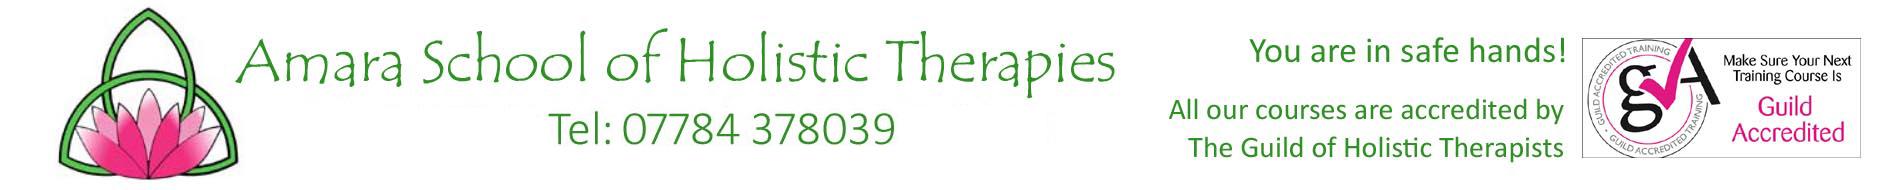 Amara School of Holistic Therapies